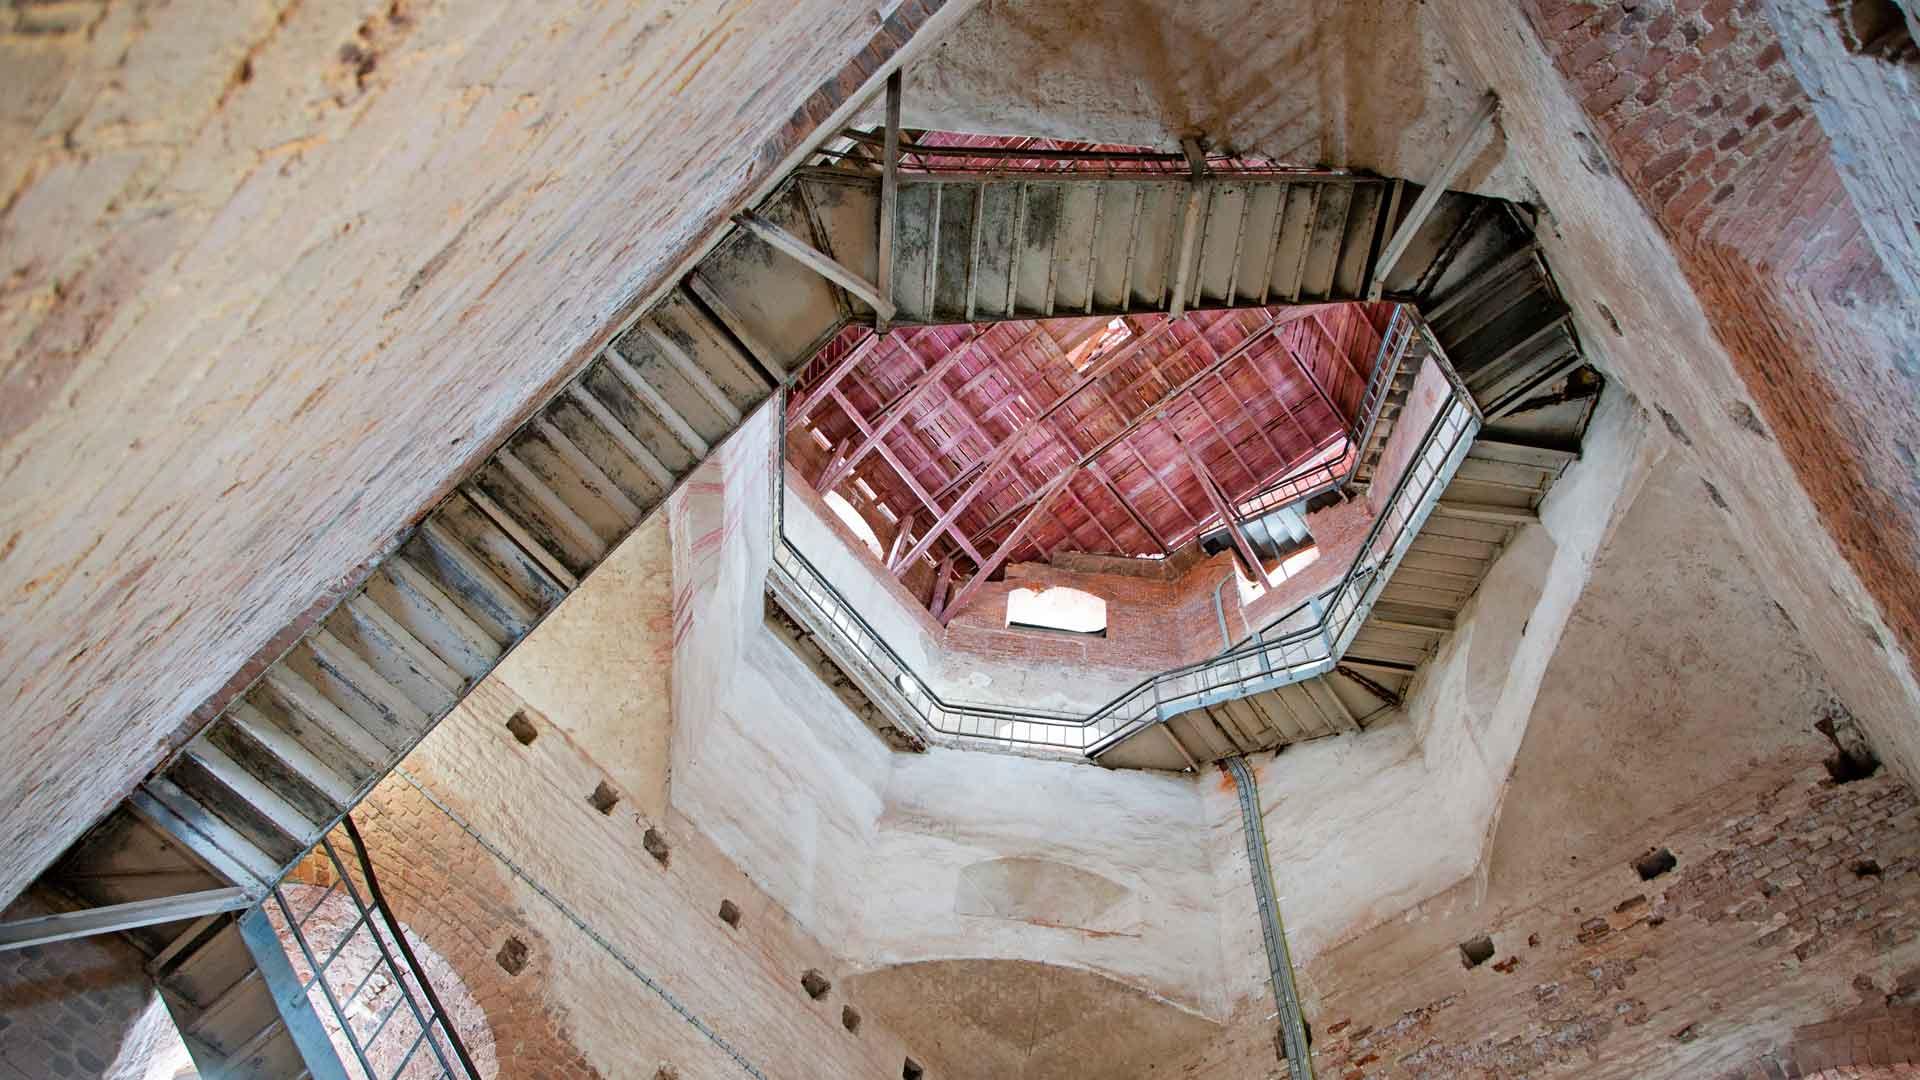 Viipurin linnan keskustorni